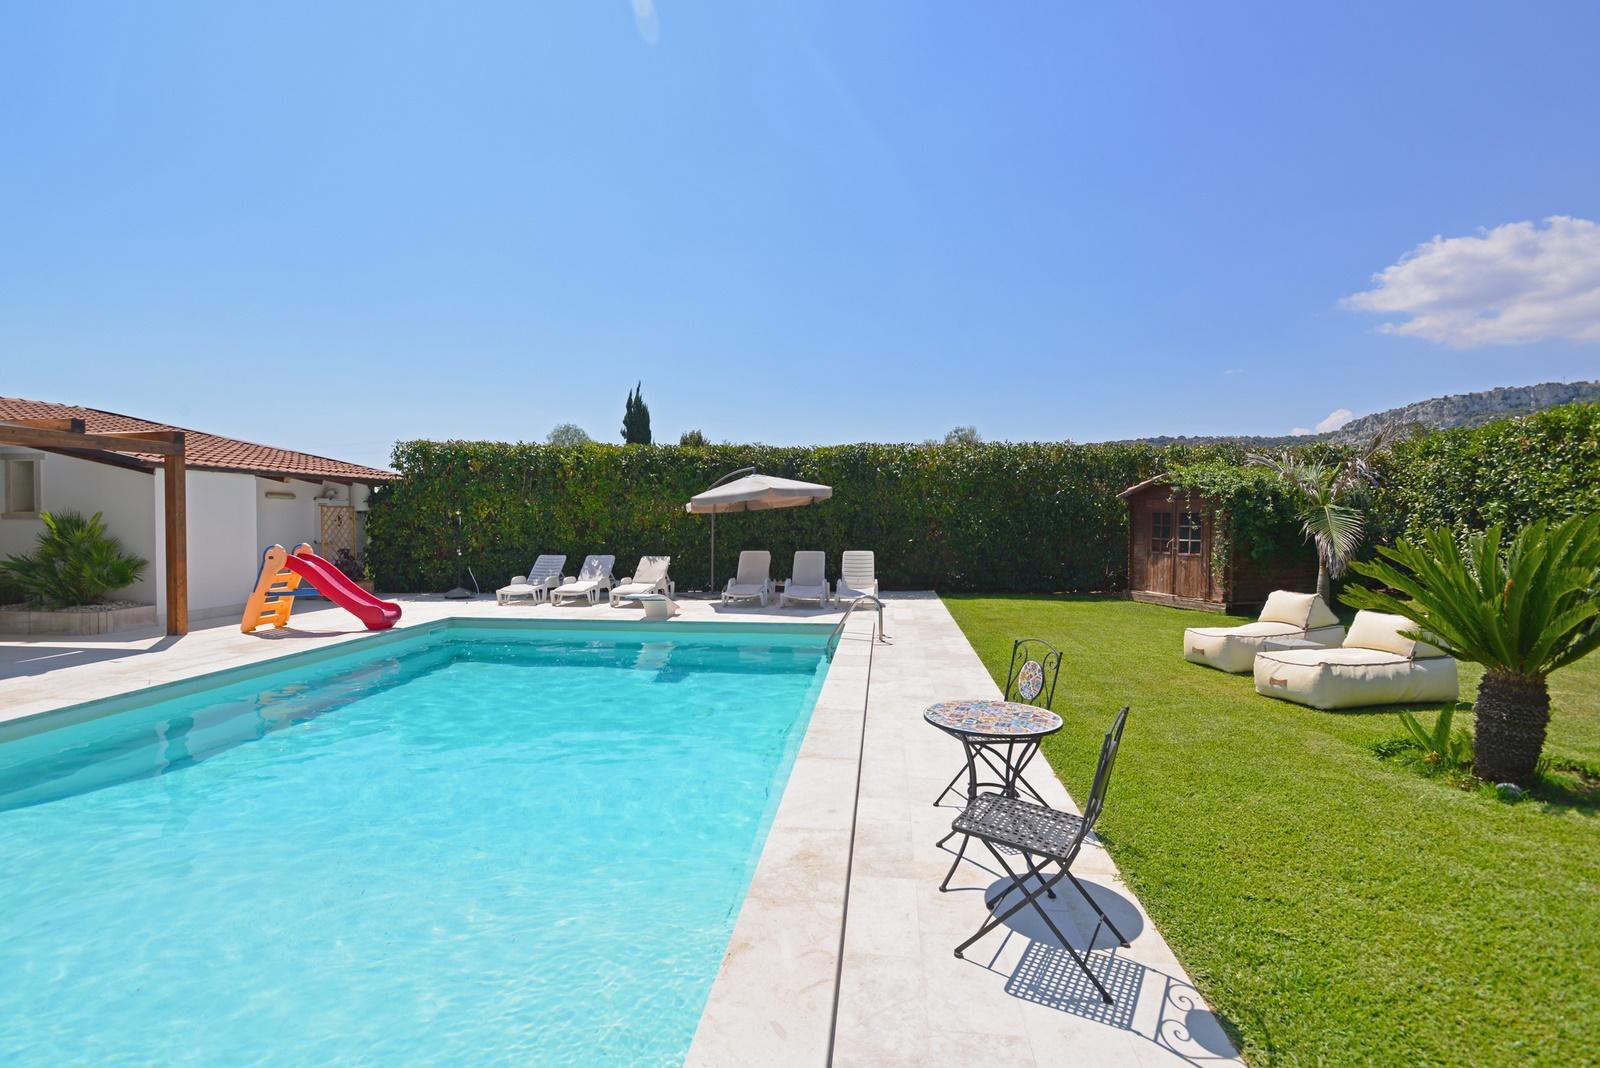 Maison de vacances Villa Monasteri (1606039), Floridia, Siracusa, Sicile, Italie, image 40